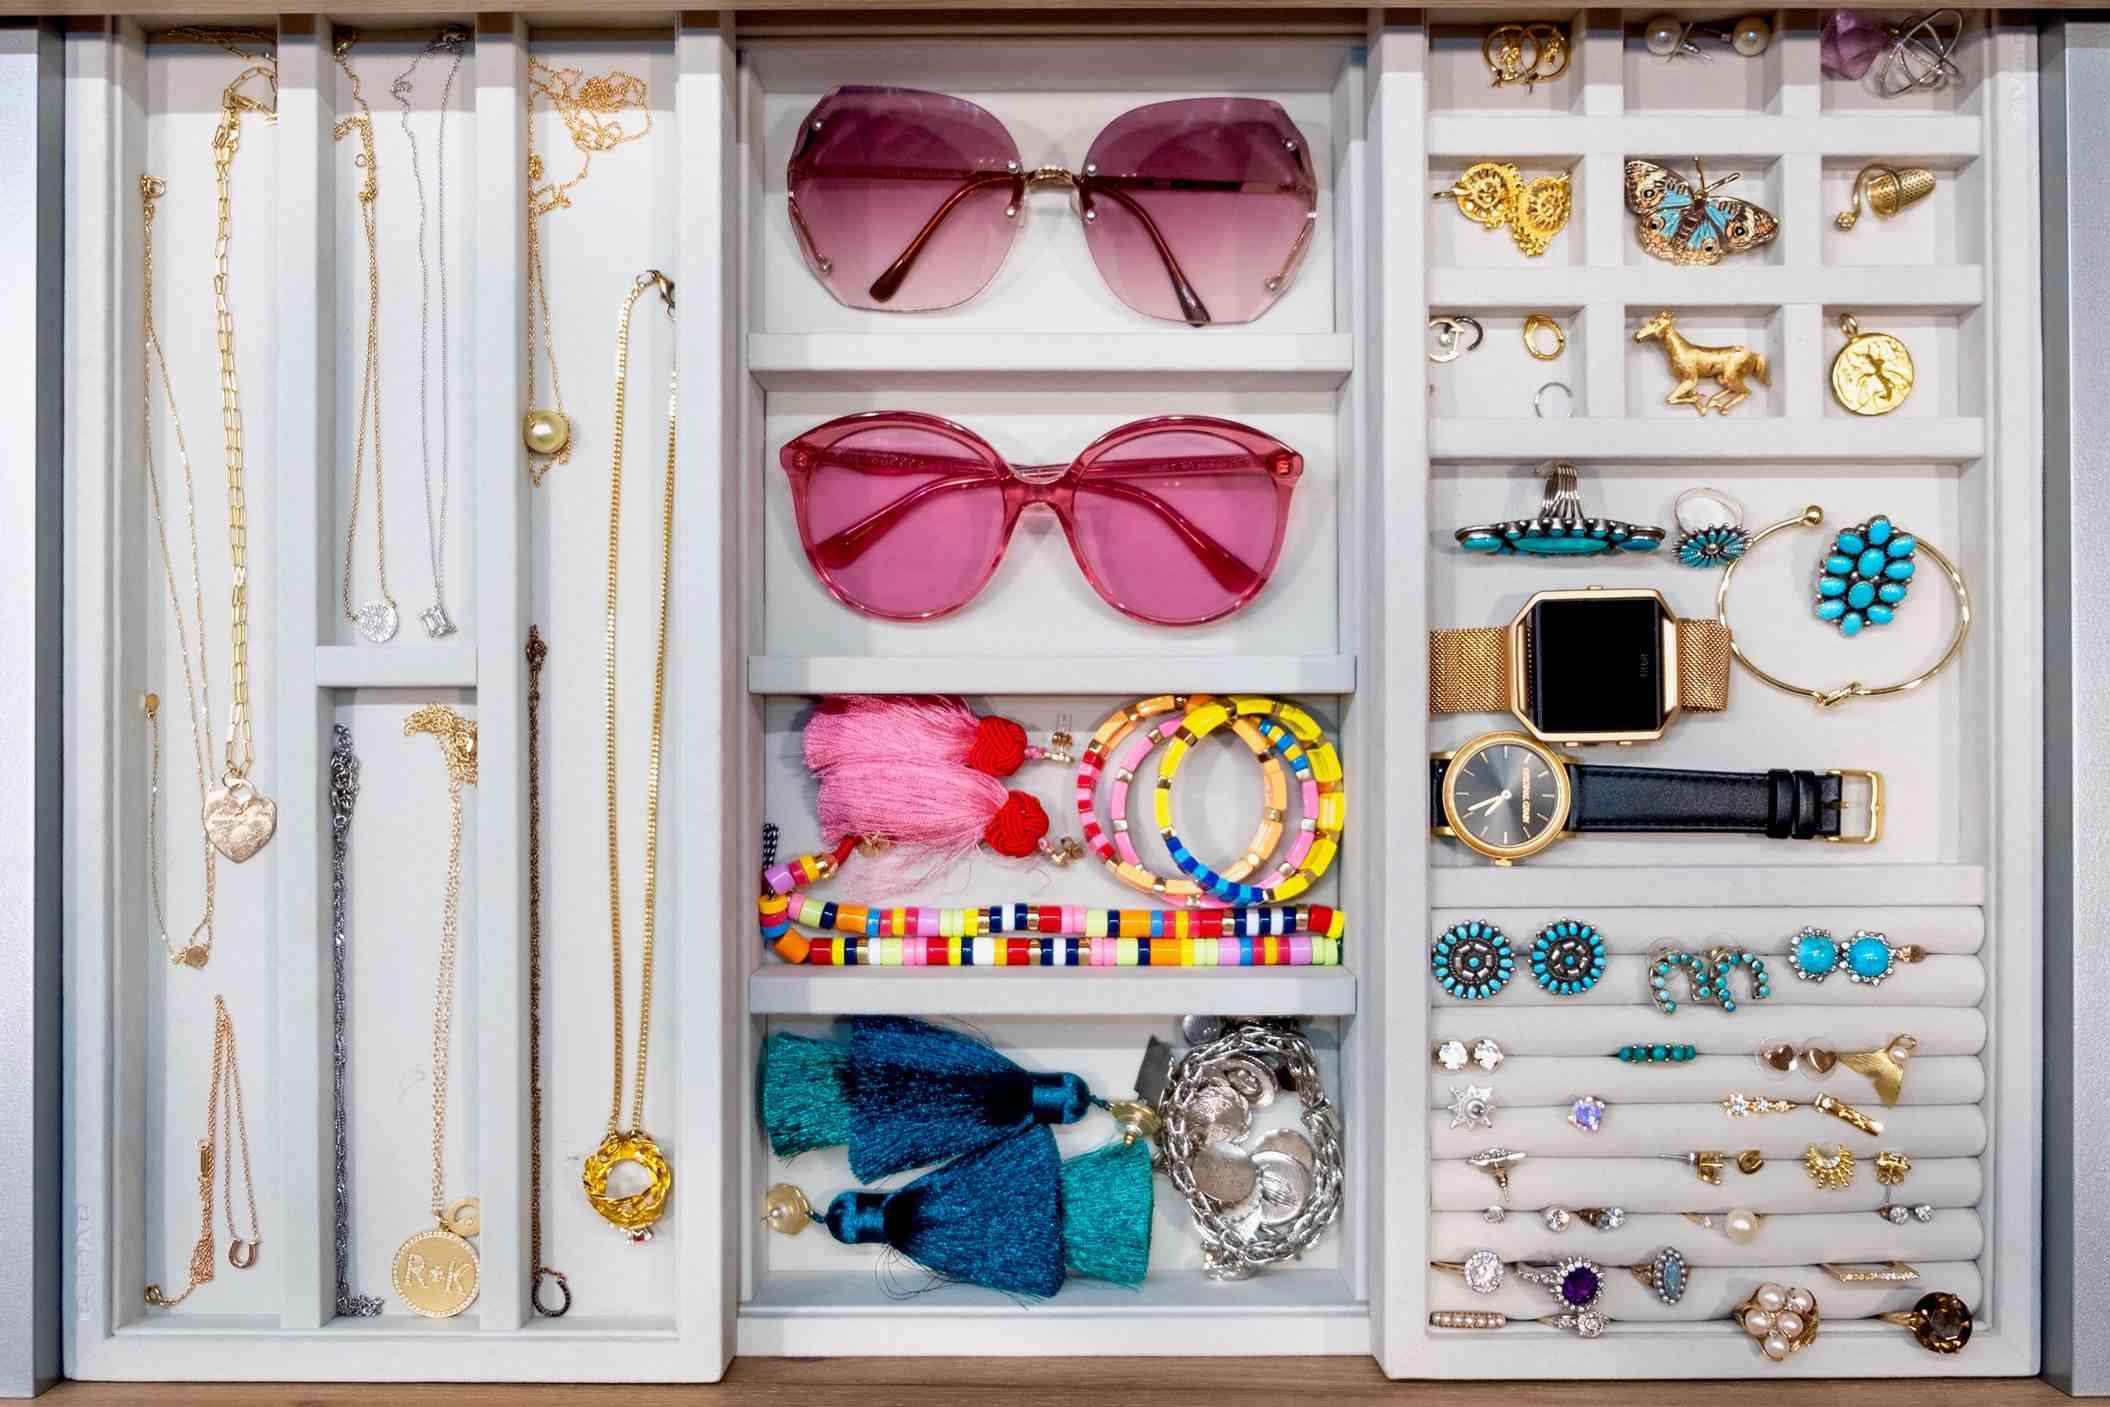 Kacey Musgraves closet